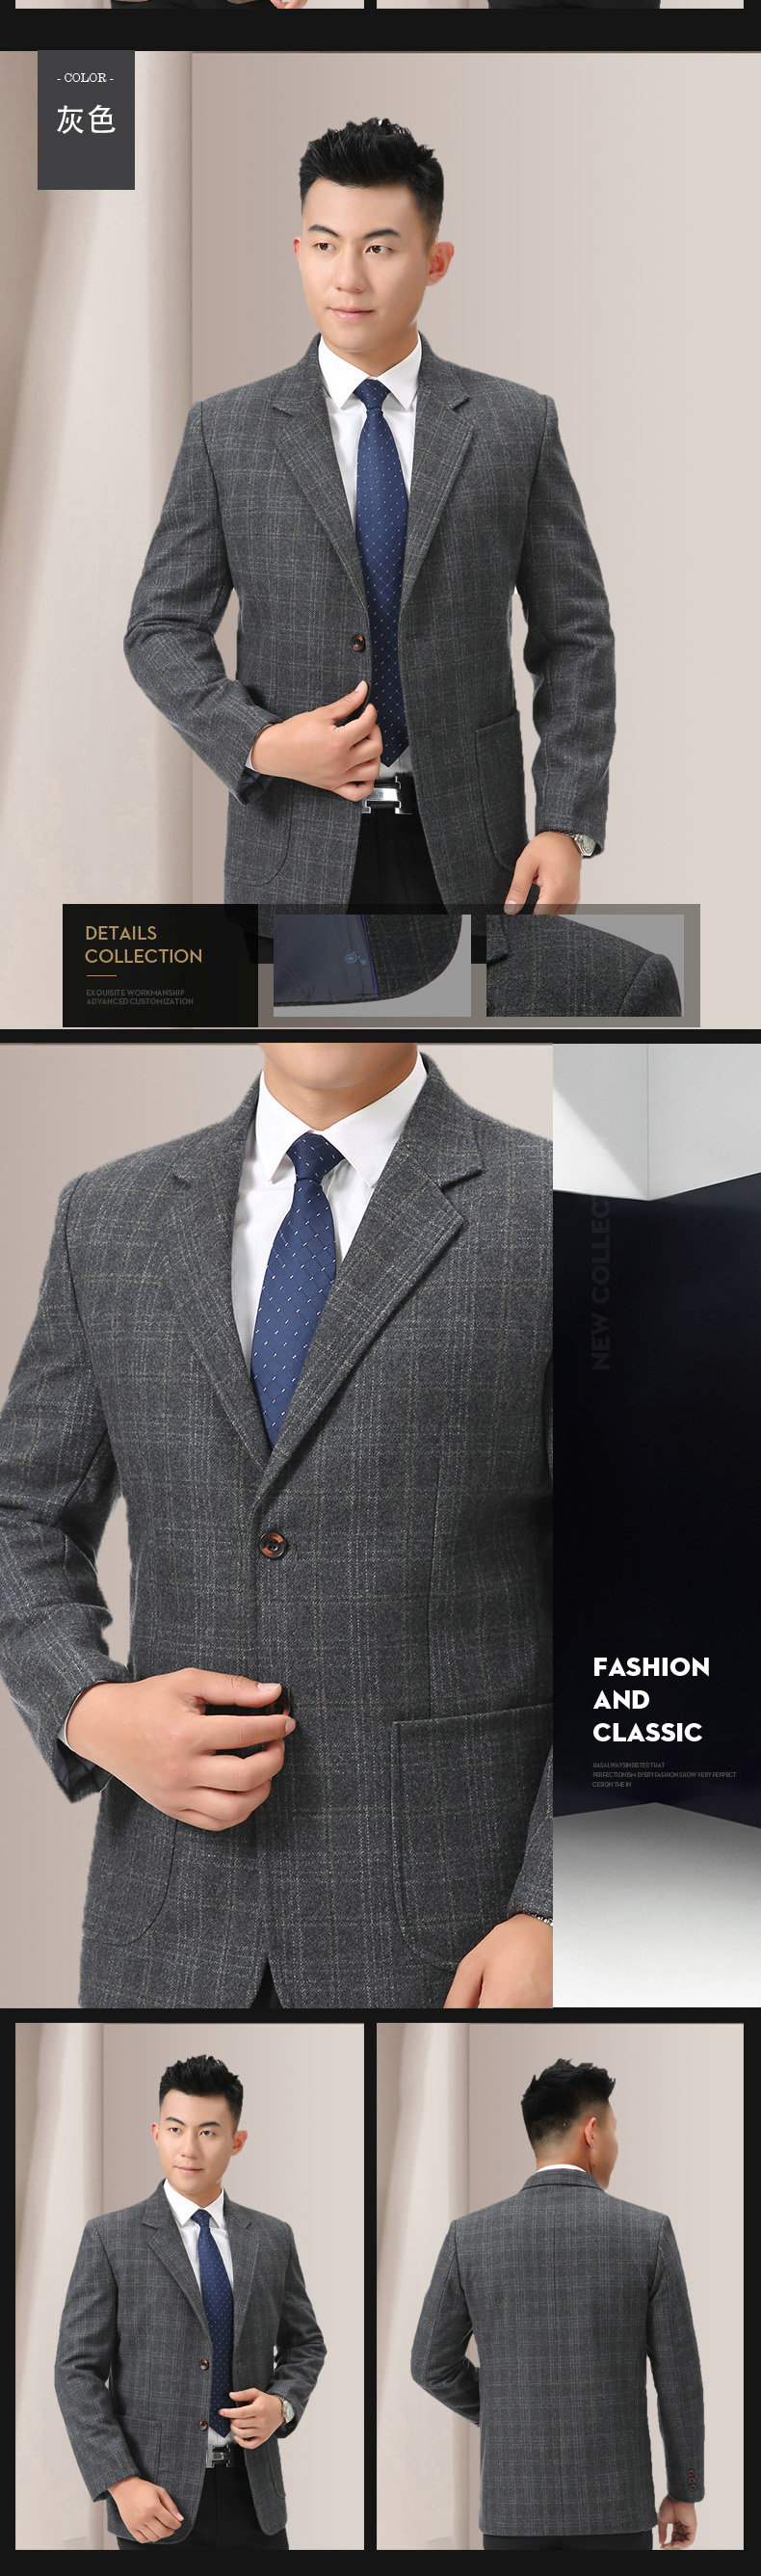 WAEOLSA Man Wool Blazer Plaid Jacket Suit Men Woollen Blends Garment Male Smart Casual Balzers Black Gray Jacket Suit Man (8)